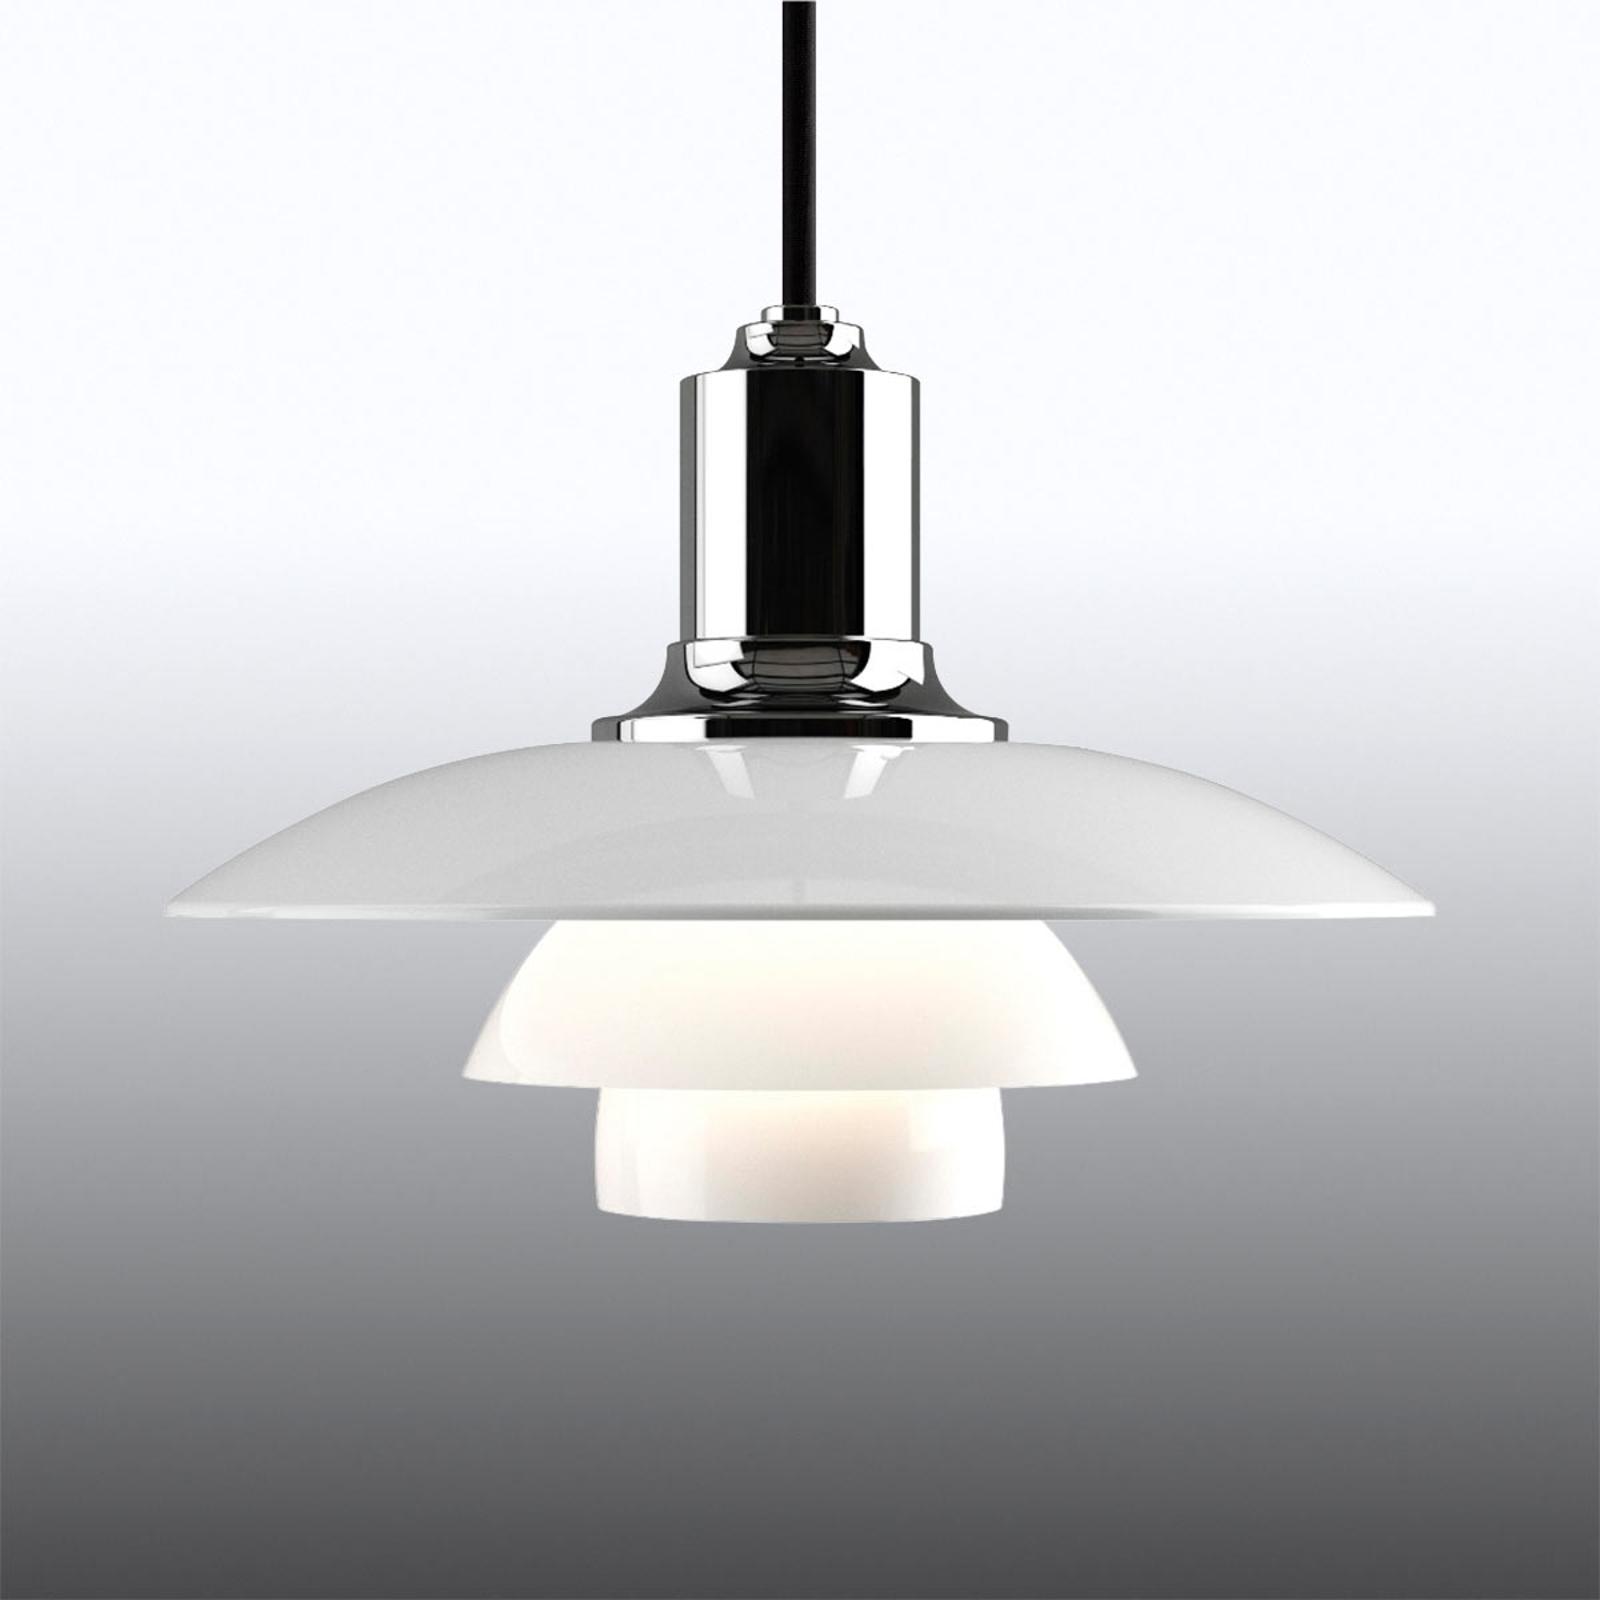 Hanglamp PH 2/1 m. drievoudige glazen kap, chroom